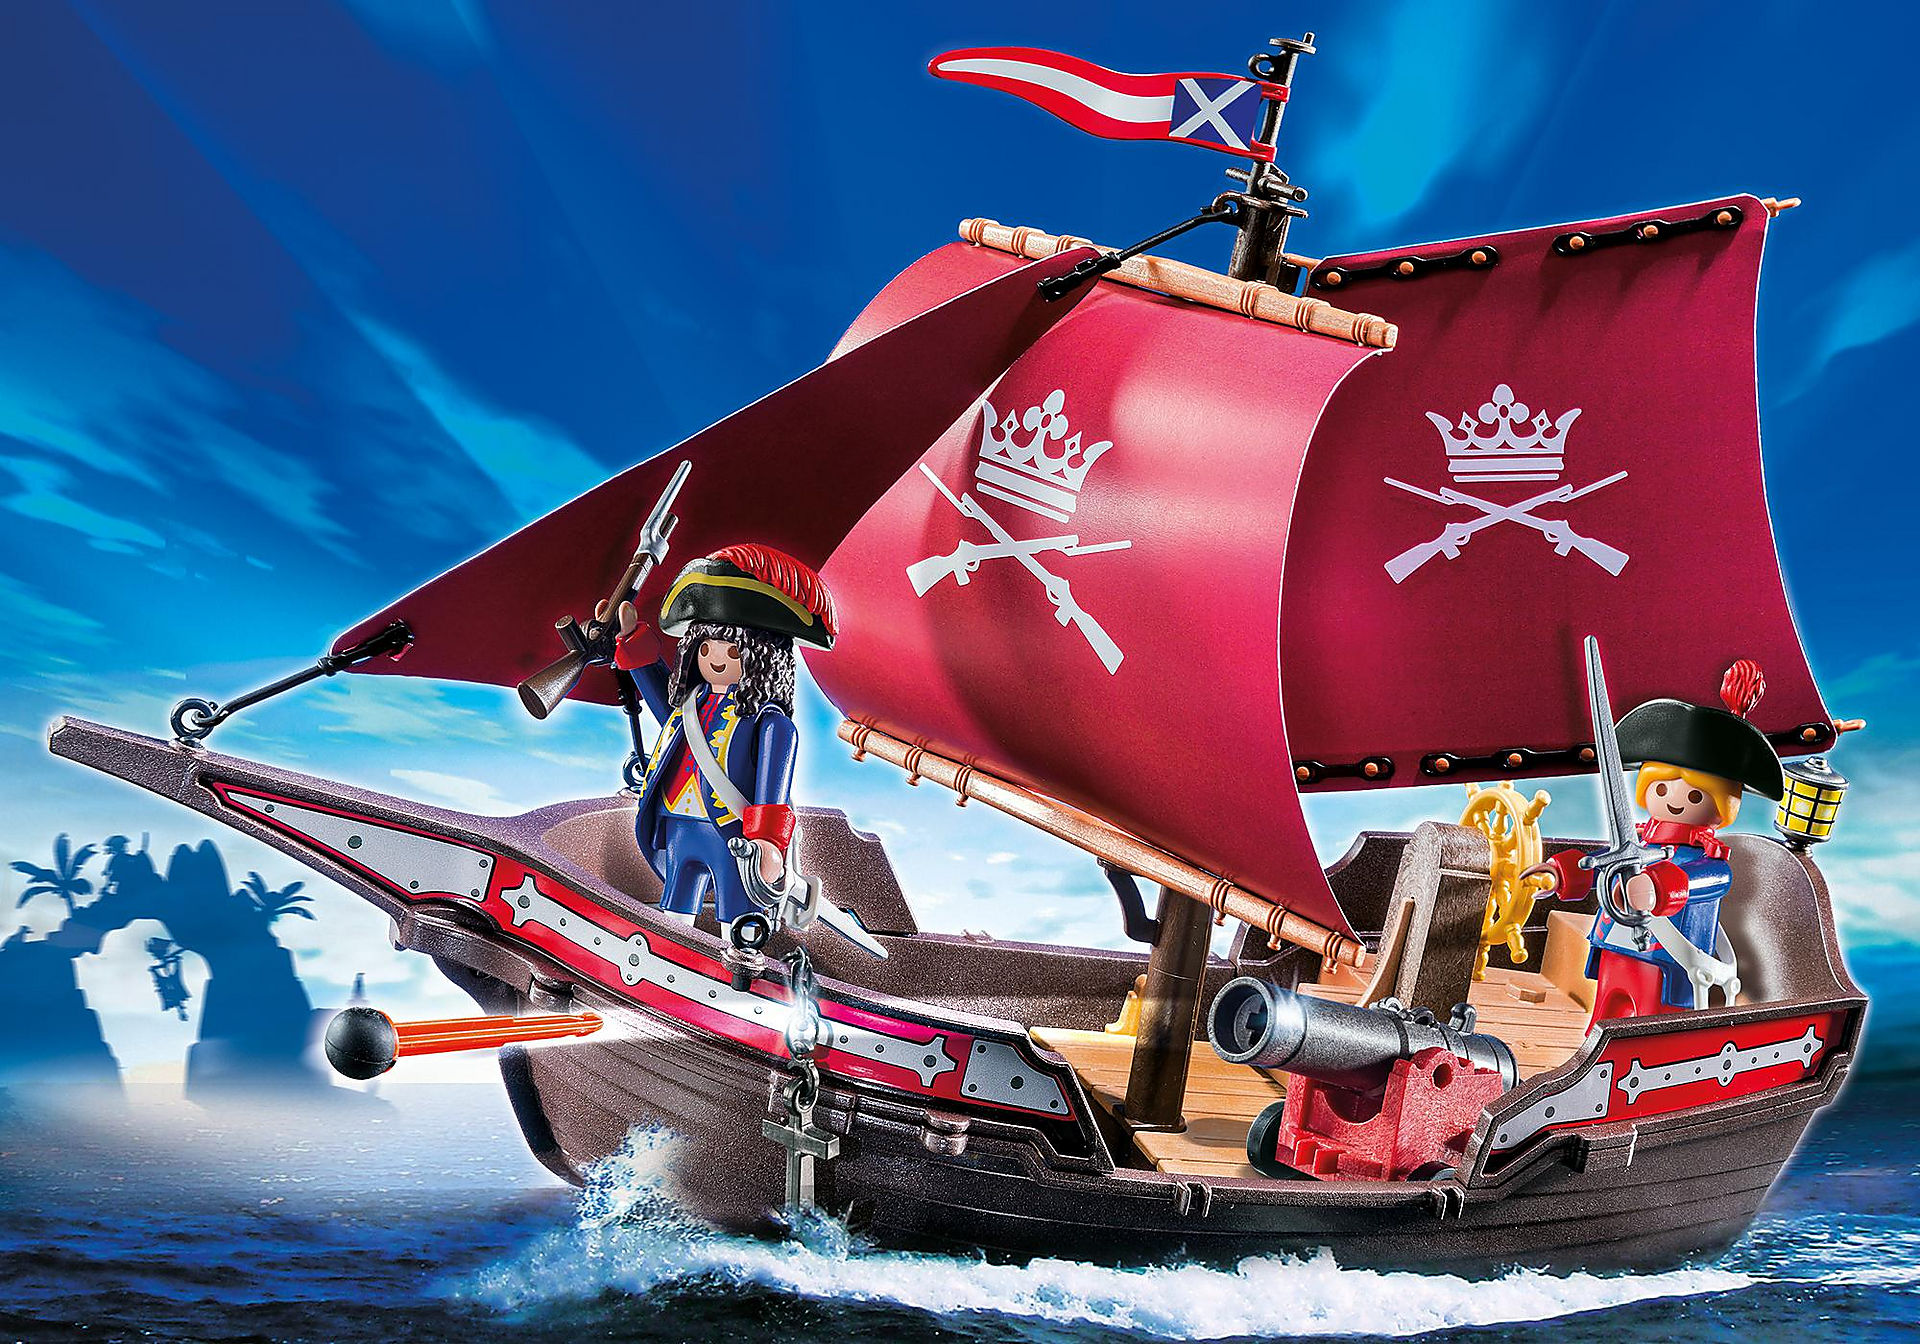 http://media.playmobil.com/i/playmobil/6681_product_detail/Soldiers' Patrol Boat